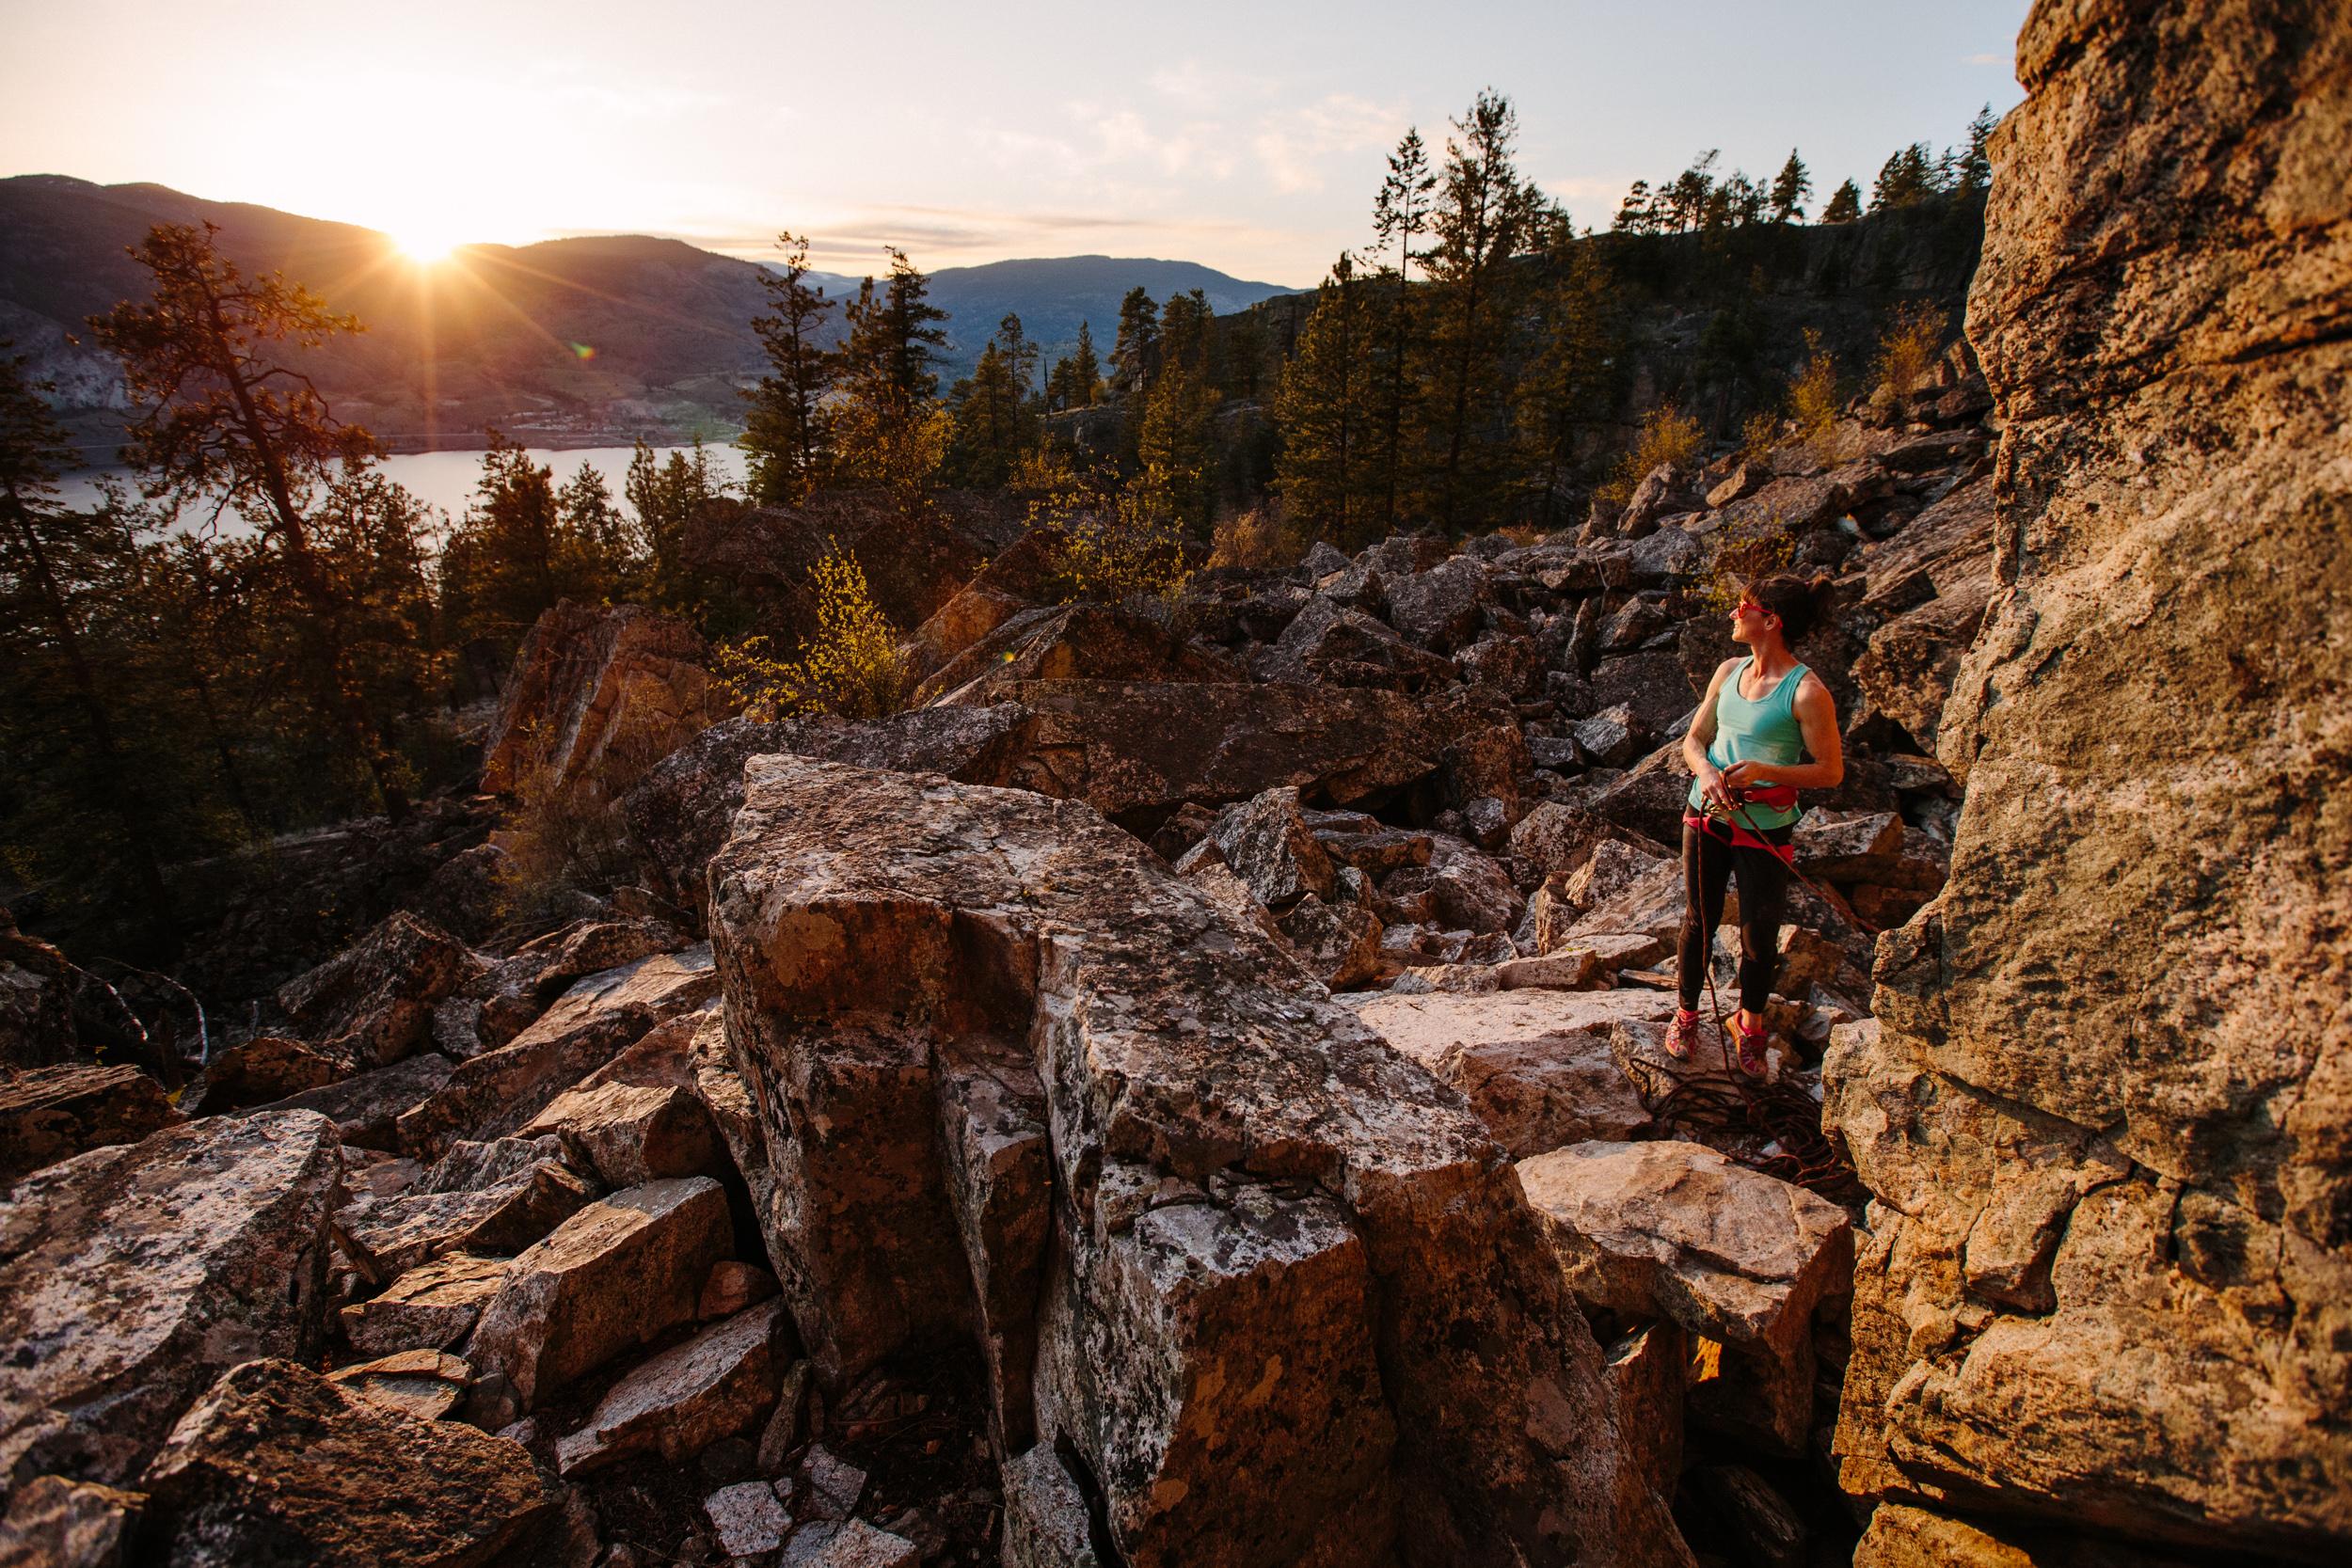 29robb-thompson-skaha-climbing-sarah-leanne-hart-.jpg